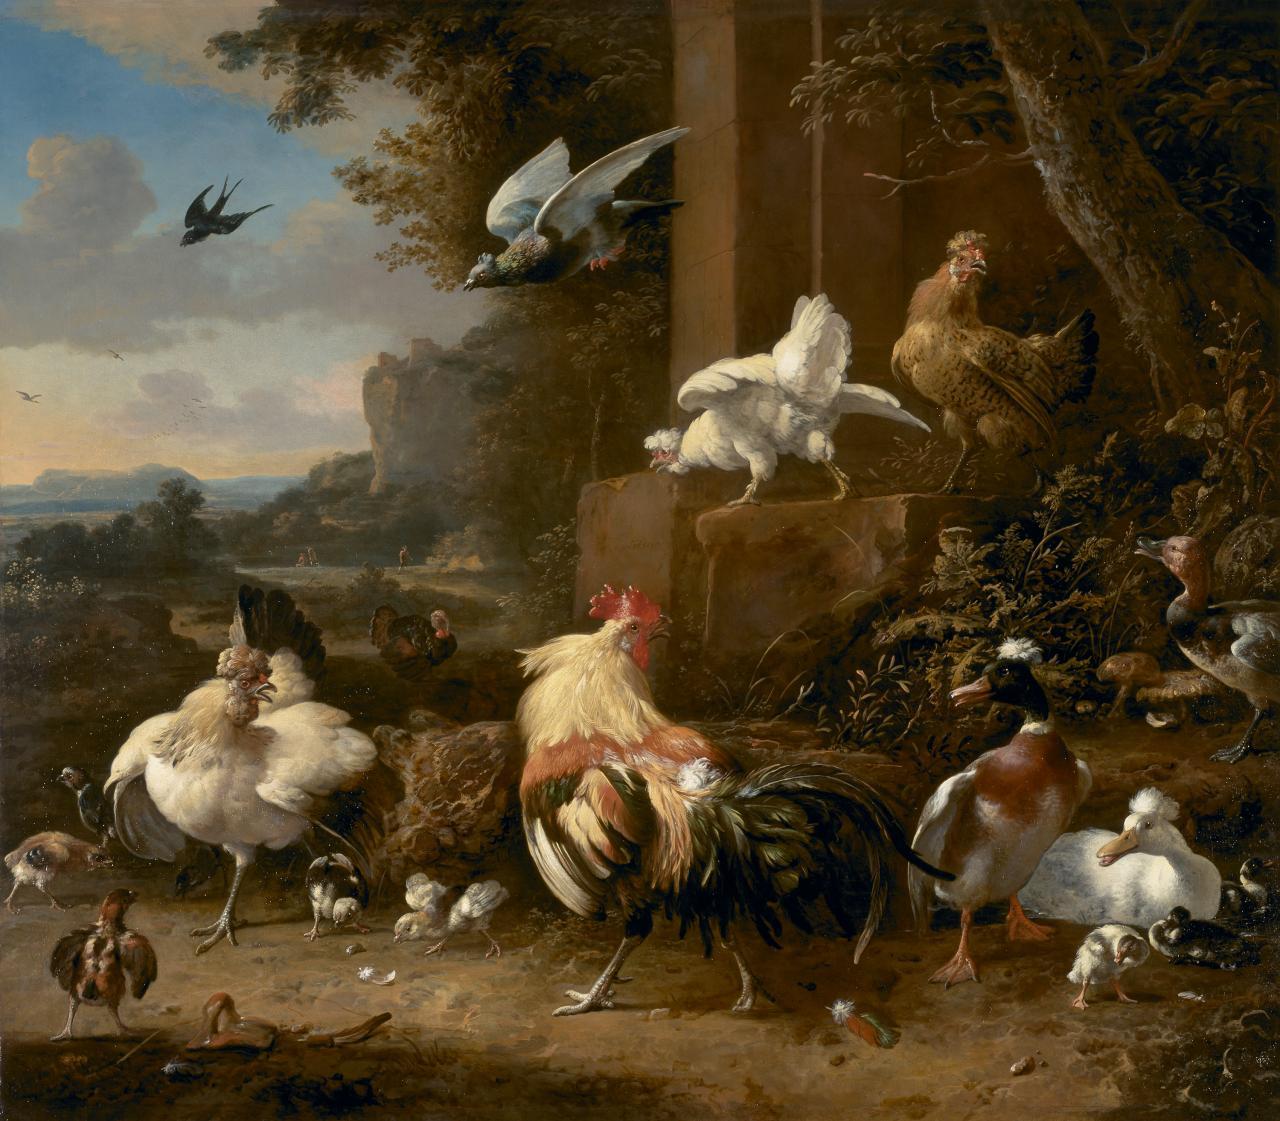 Melchior de Hondecoeter: The Poultry Yard